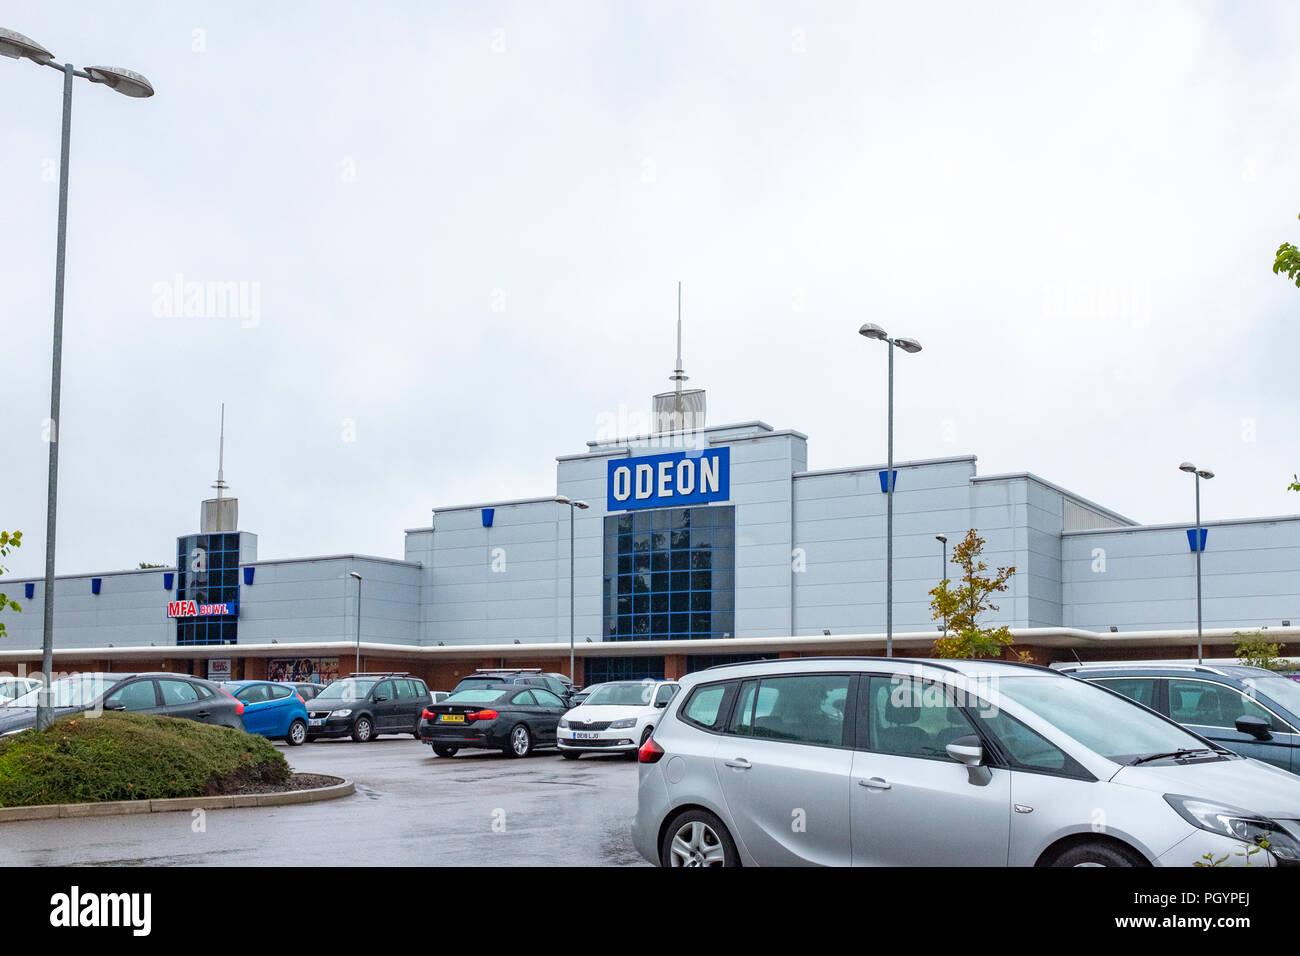 Odeon cinema and MFA Bowl in Crewe Cheshire UK - Stock Image